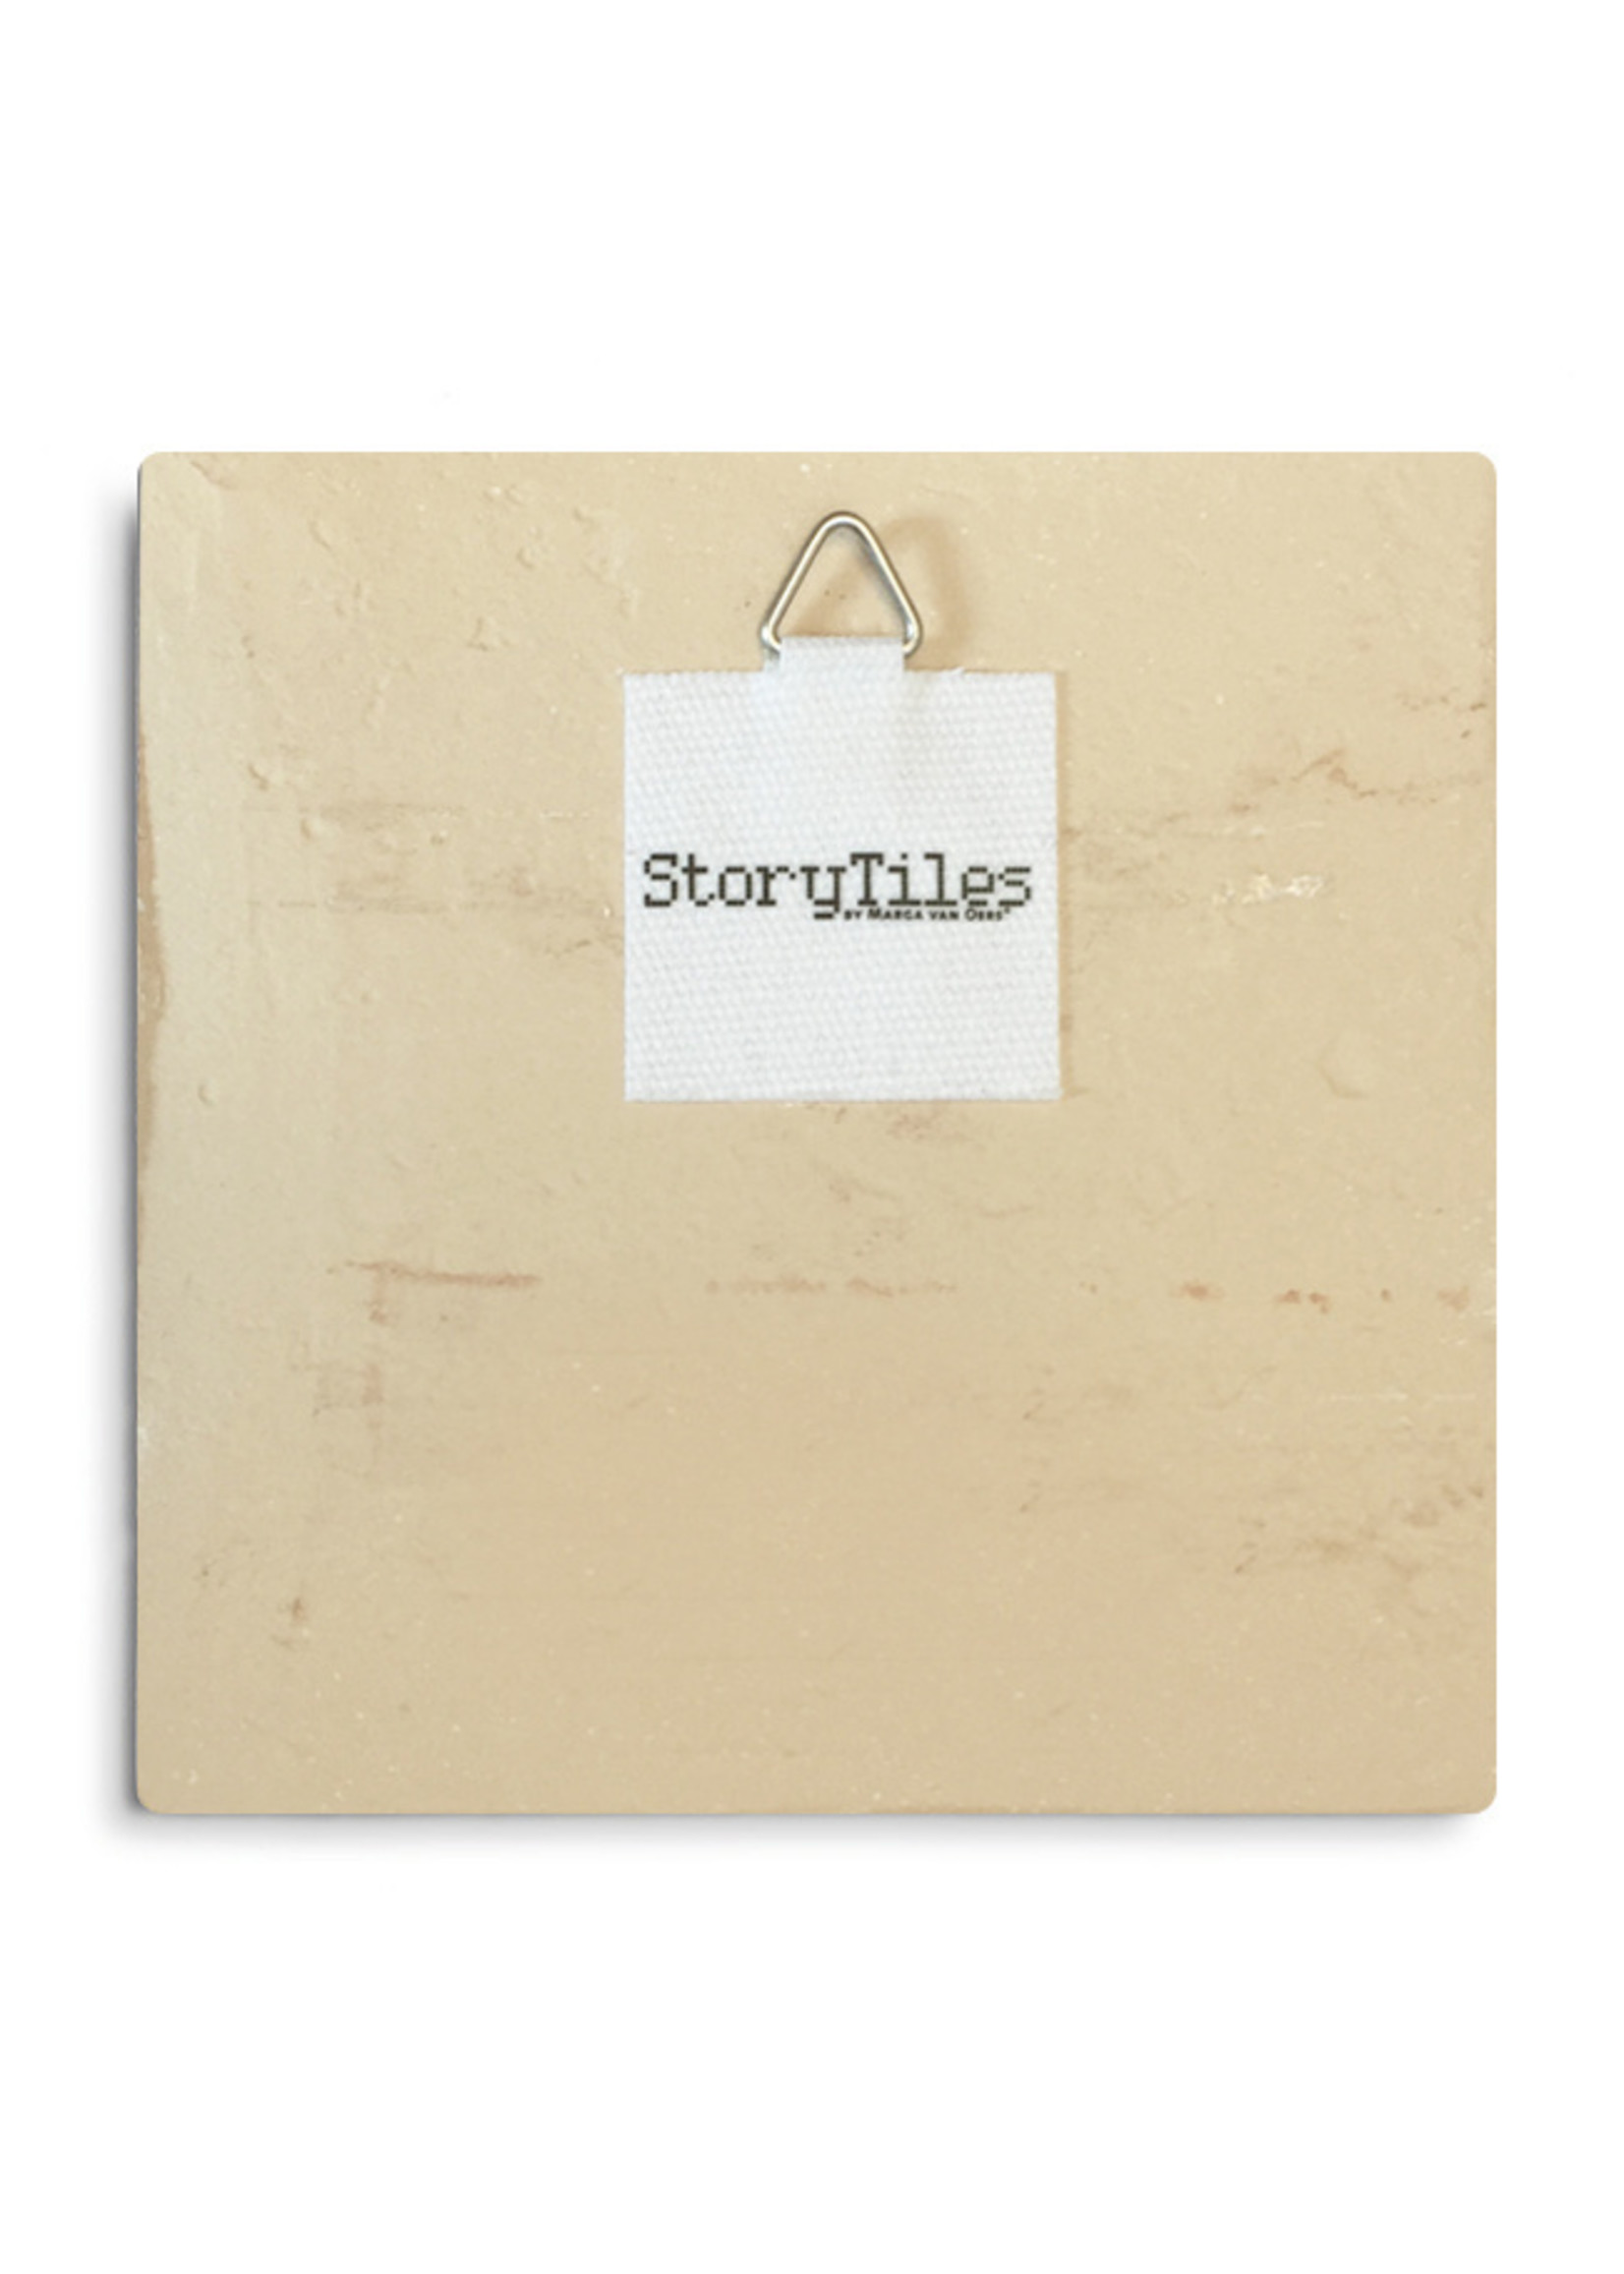 Storytiles Bananas 13x13cm